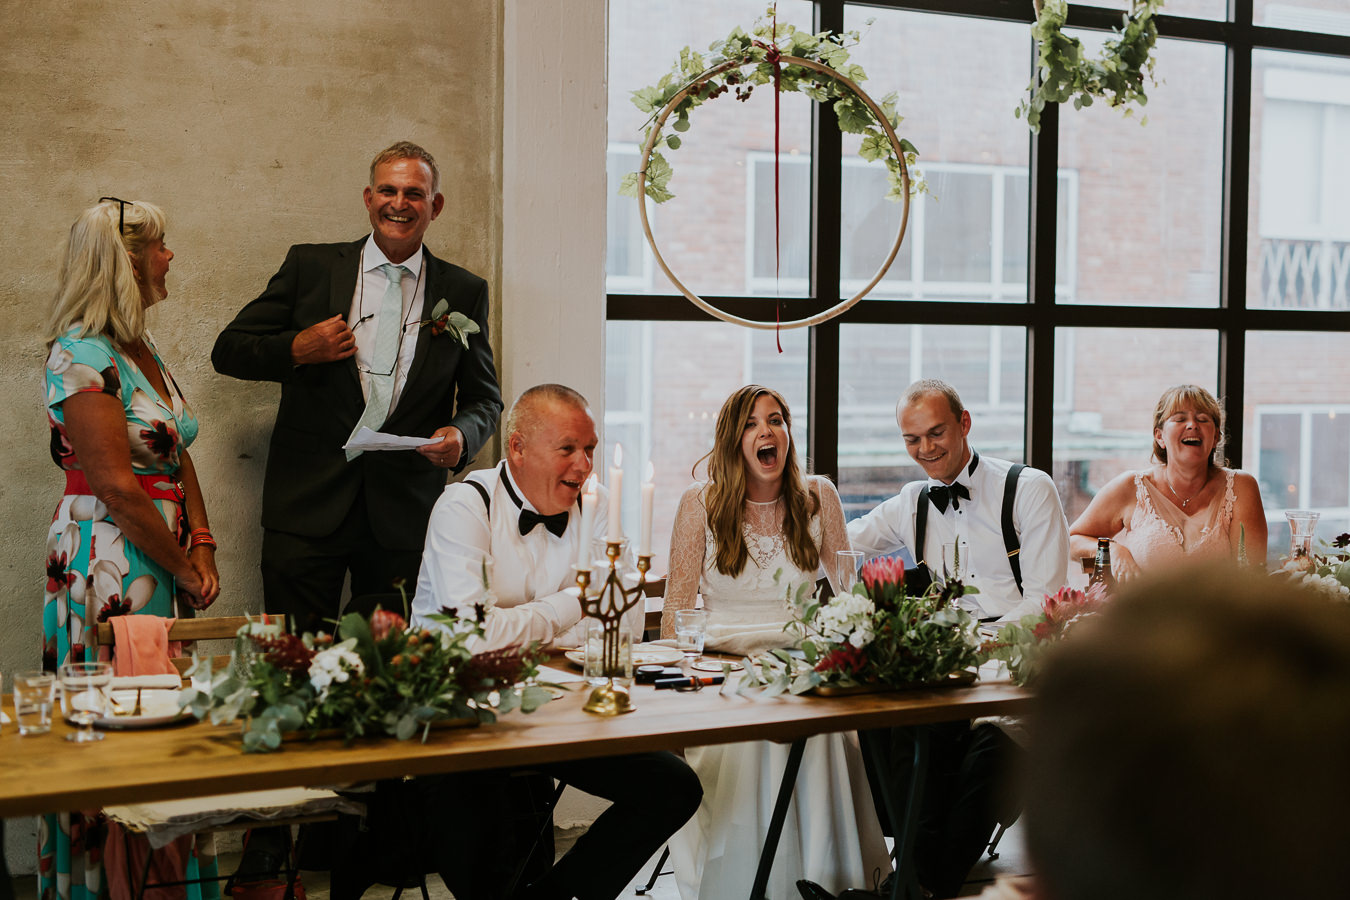 Bryllup-Lageret-Tofte-bryllupsfotograf-174.jpg